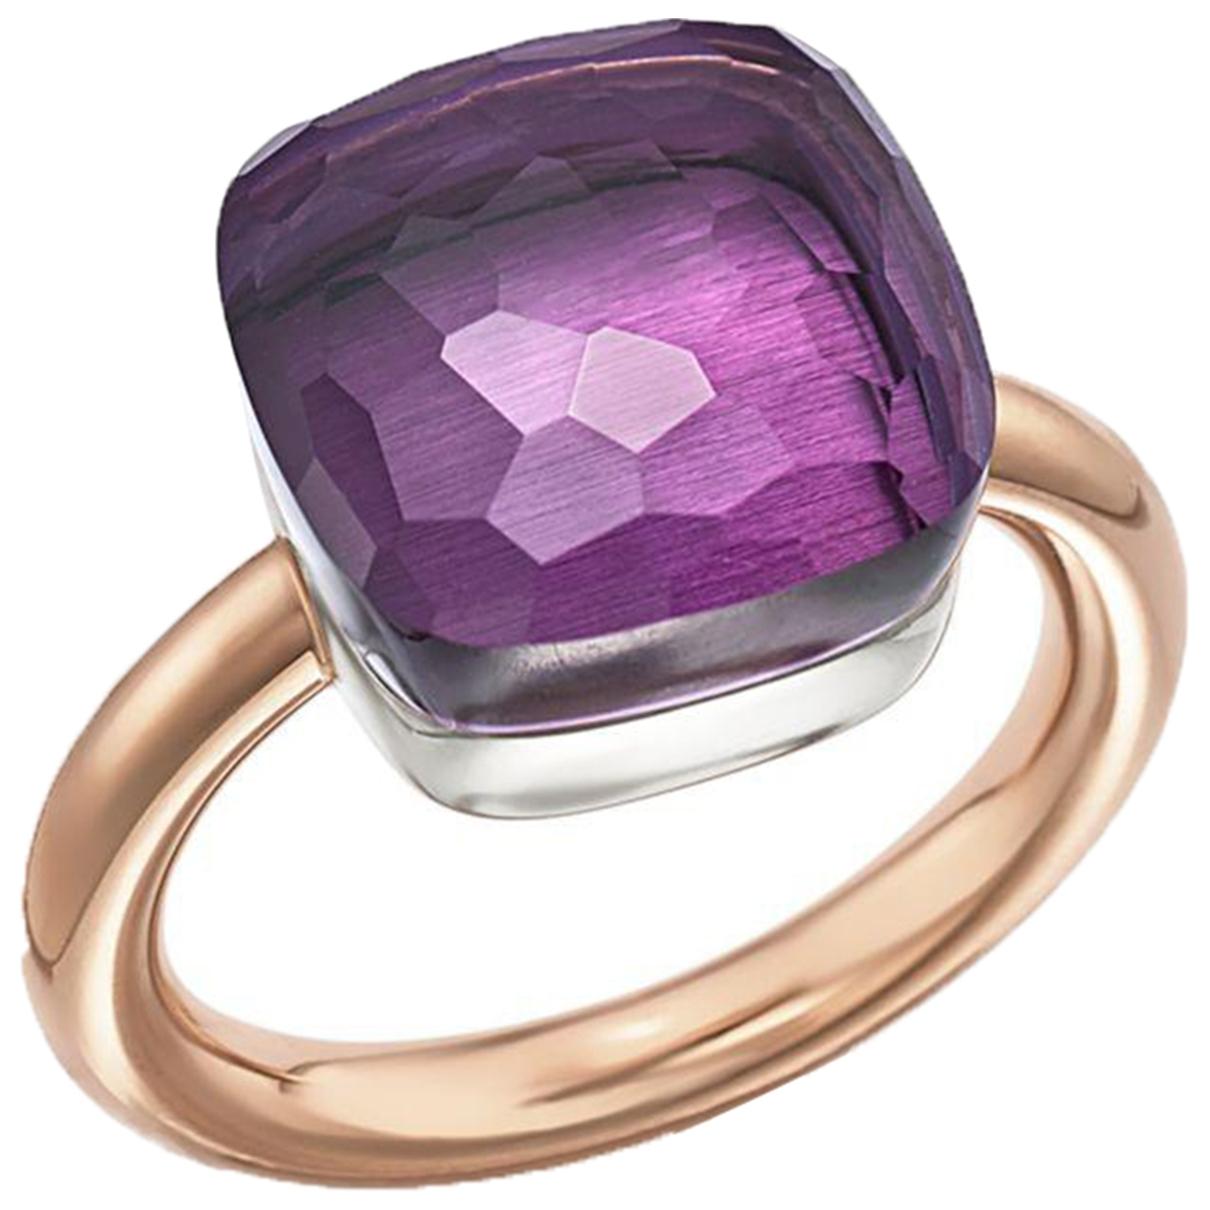 Pomellato Nudo Purple Yellow gold ring for Women 6 ¼ US